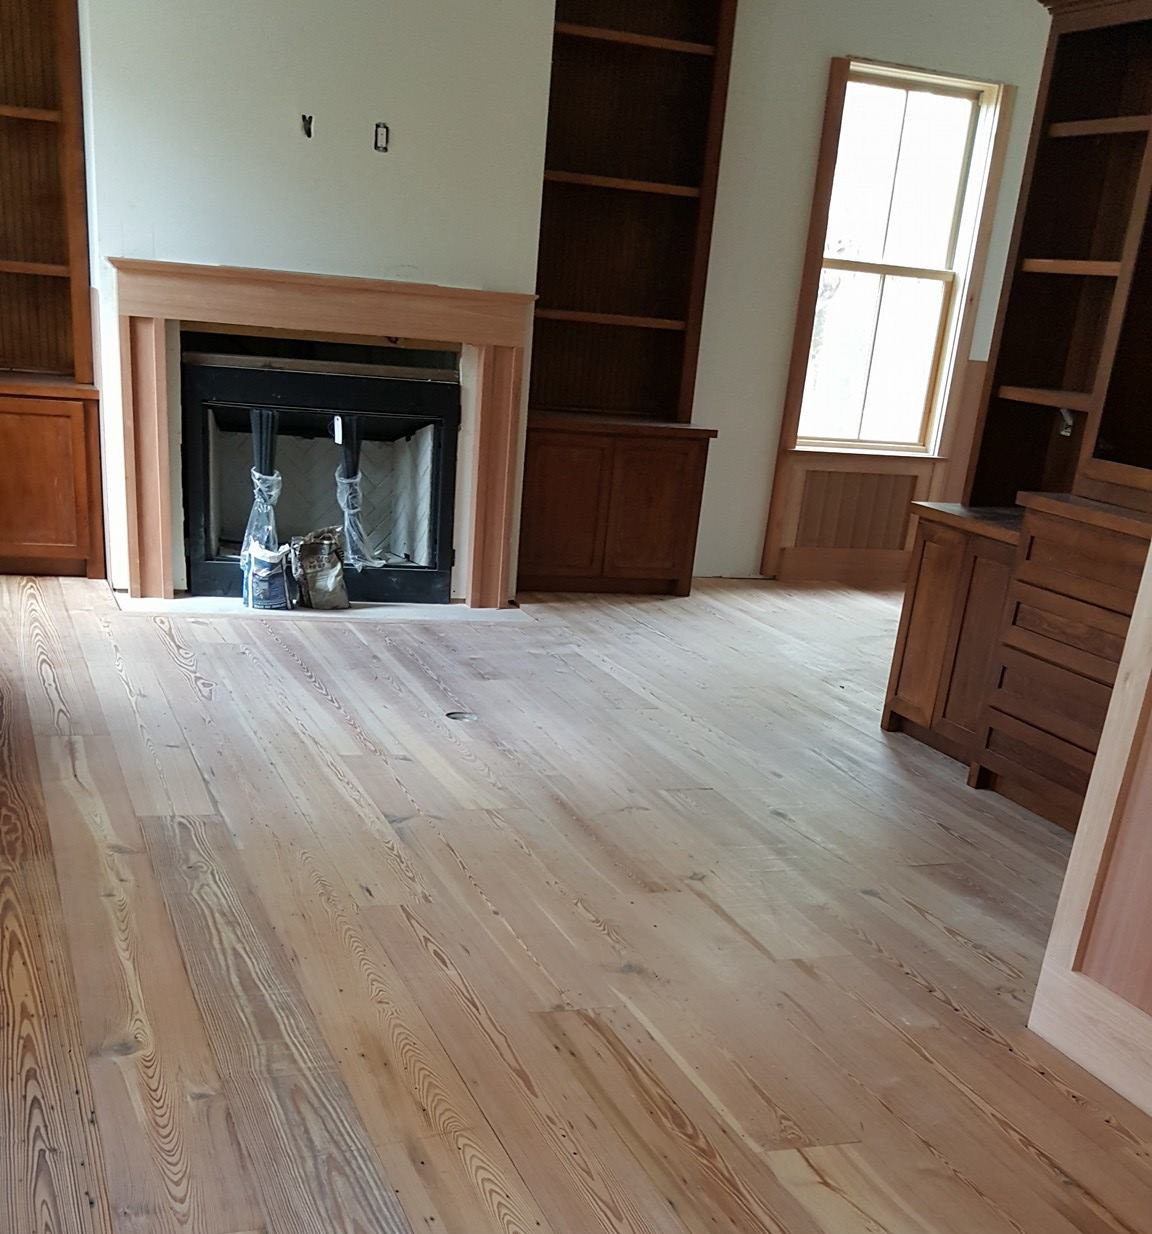 hardwood floor refinishing downers grove il of olde savannah hardwood flooring within sand and refinish existing floors